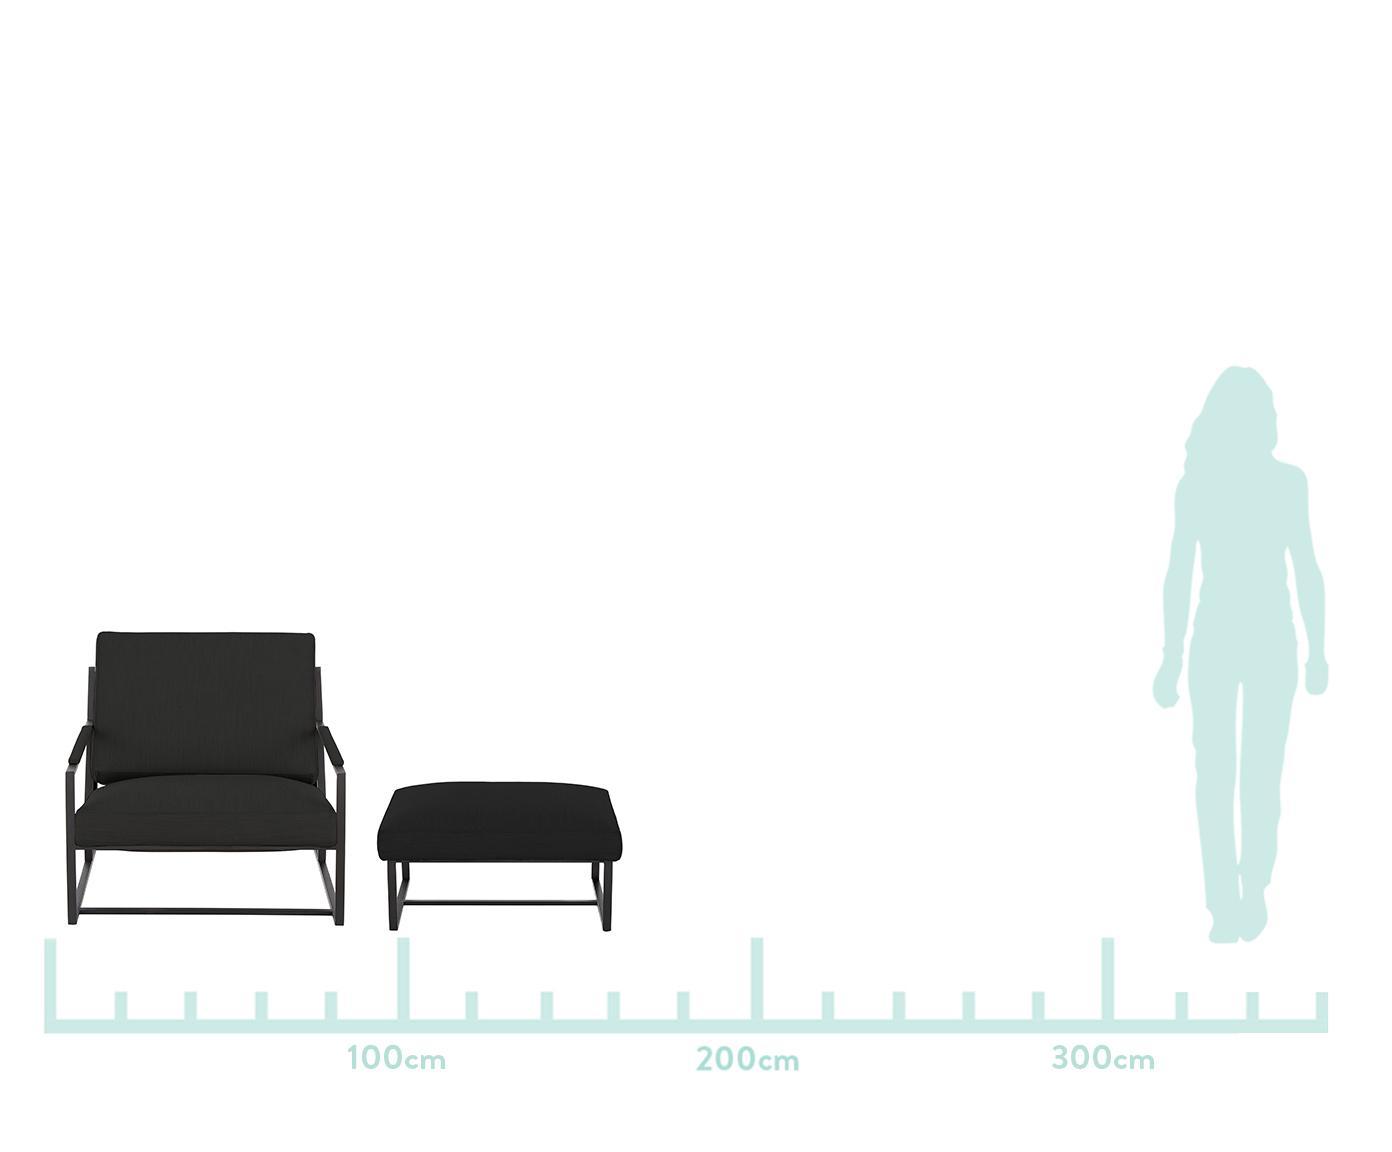 Chaise lounge Andy, 2 élém., Tissu anthracite